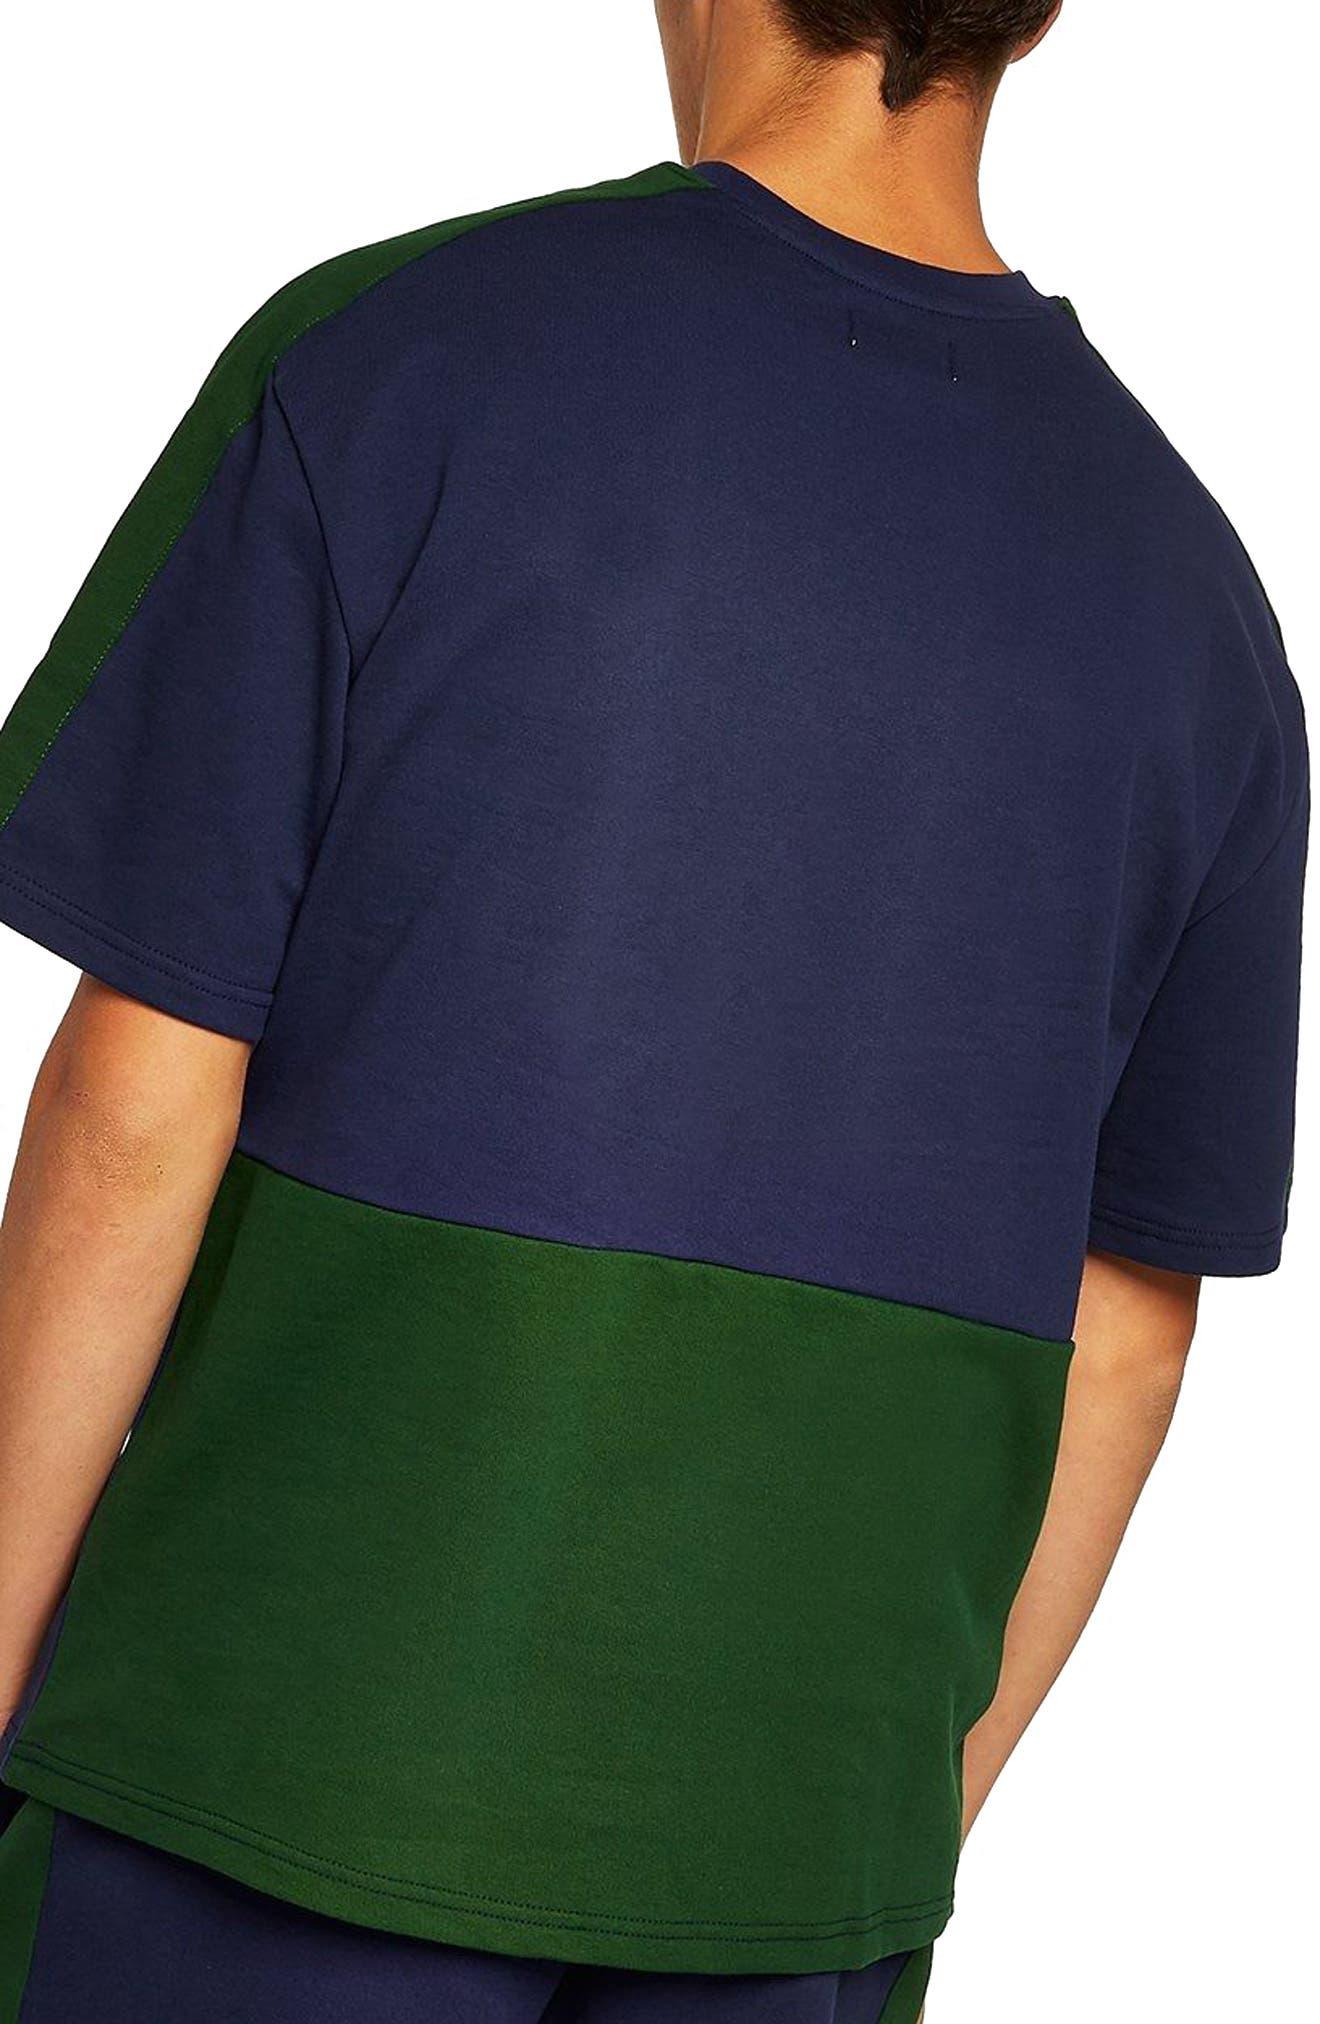 Colorblock Short Sleeve Sweatshirt,                             Alternate thumbnail 2, color,                             Navy Blue Multi